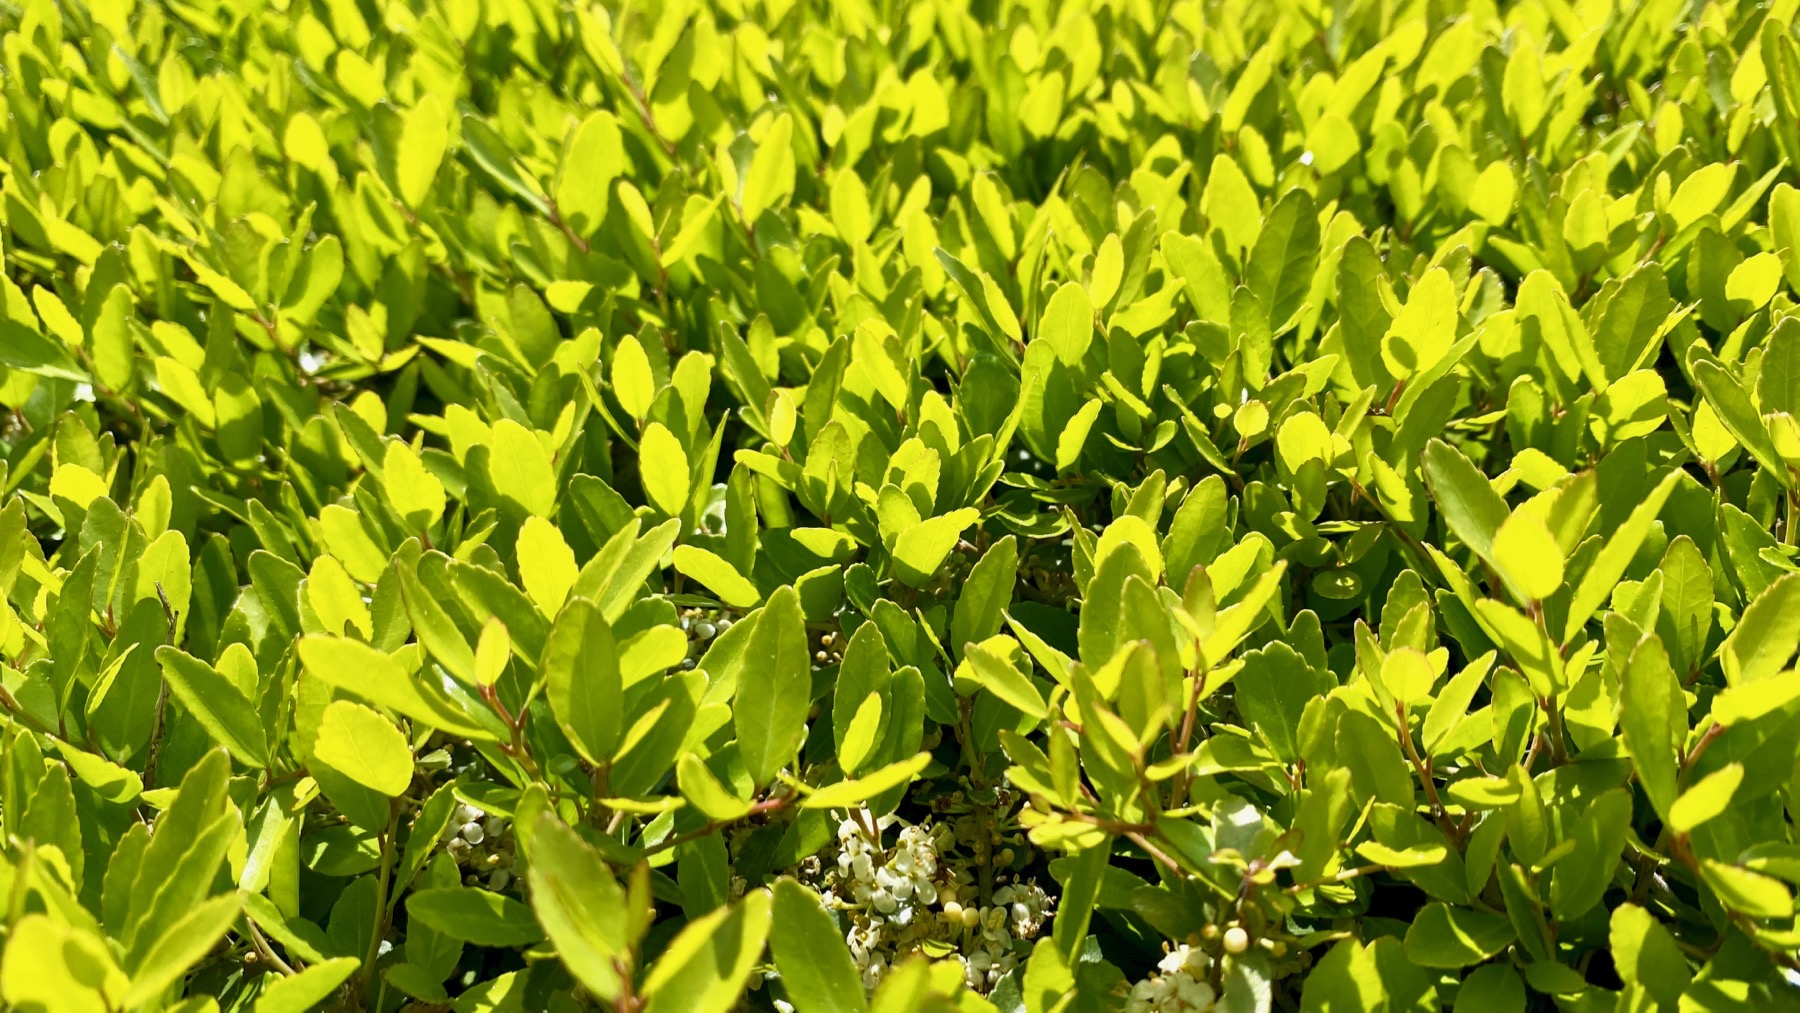 Hedge new leaves